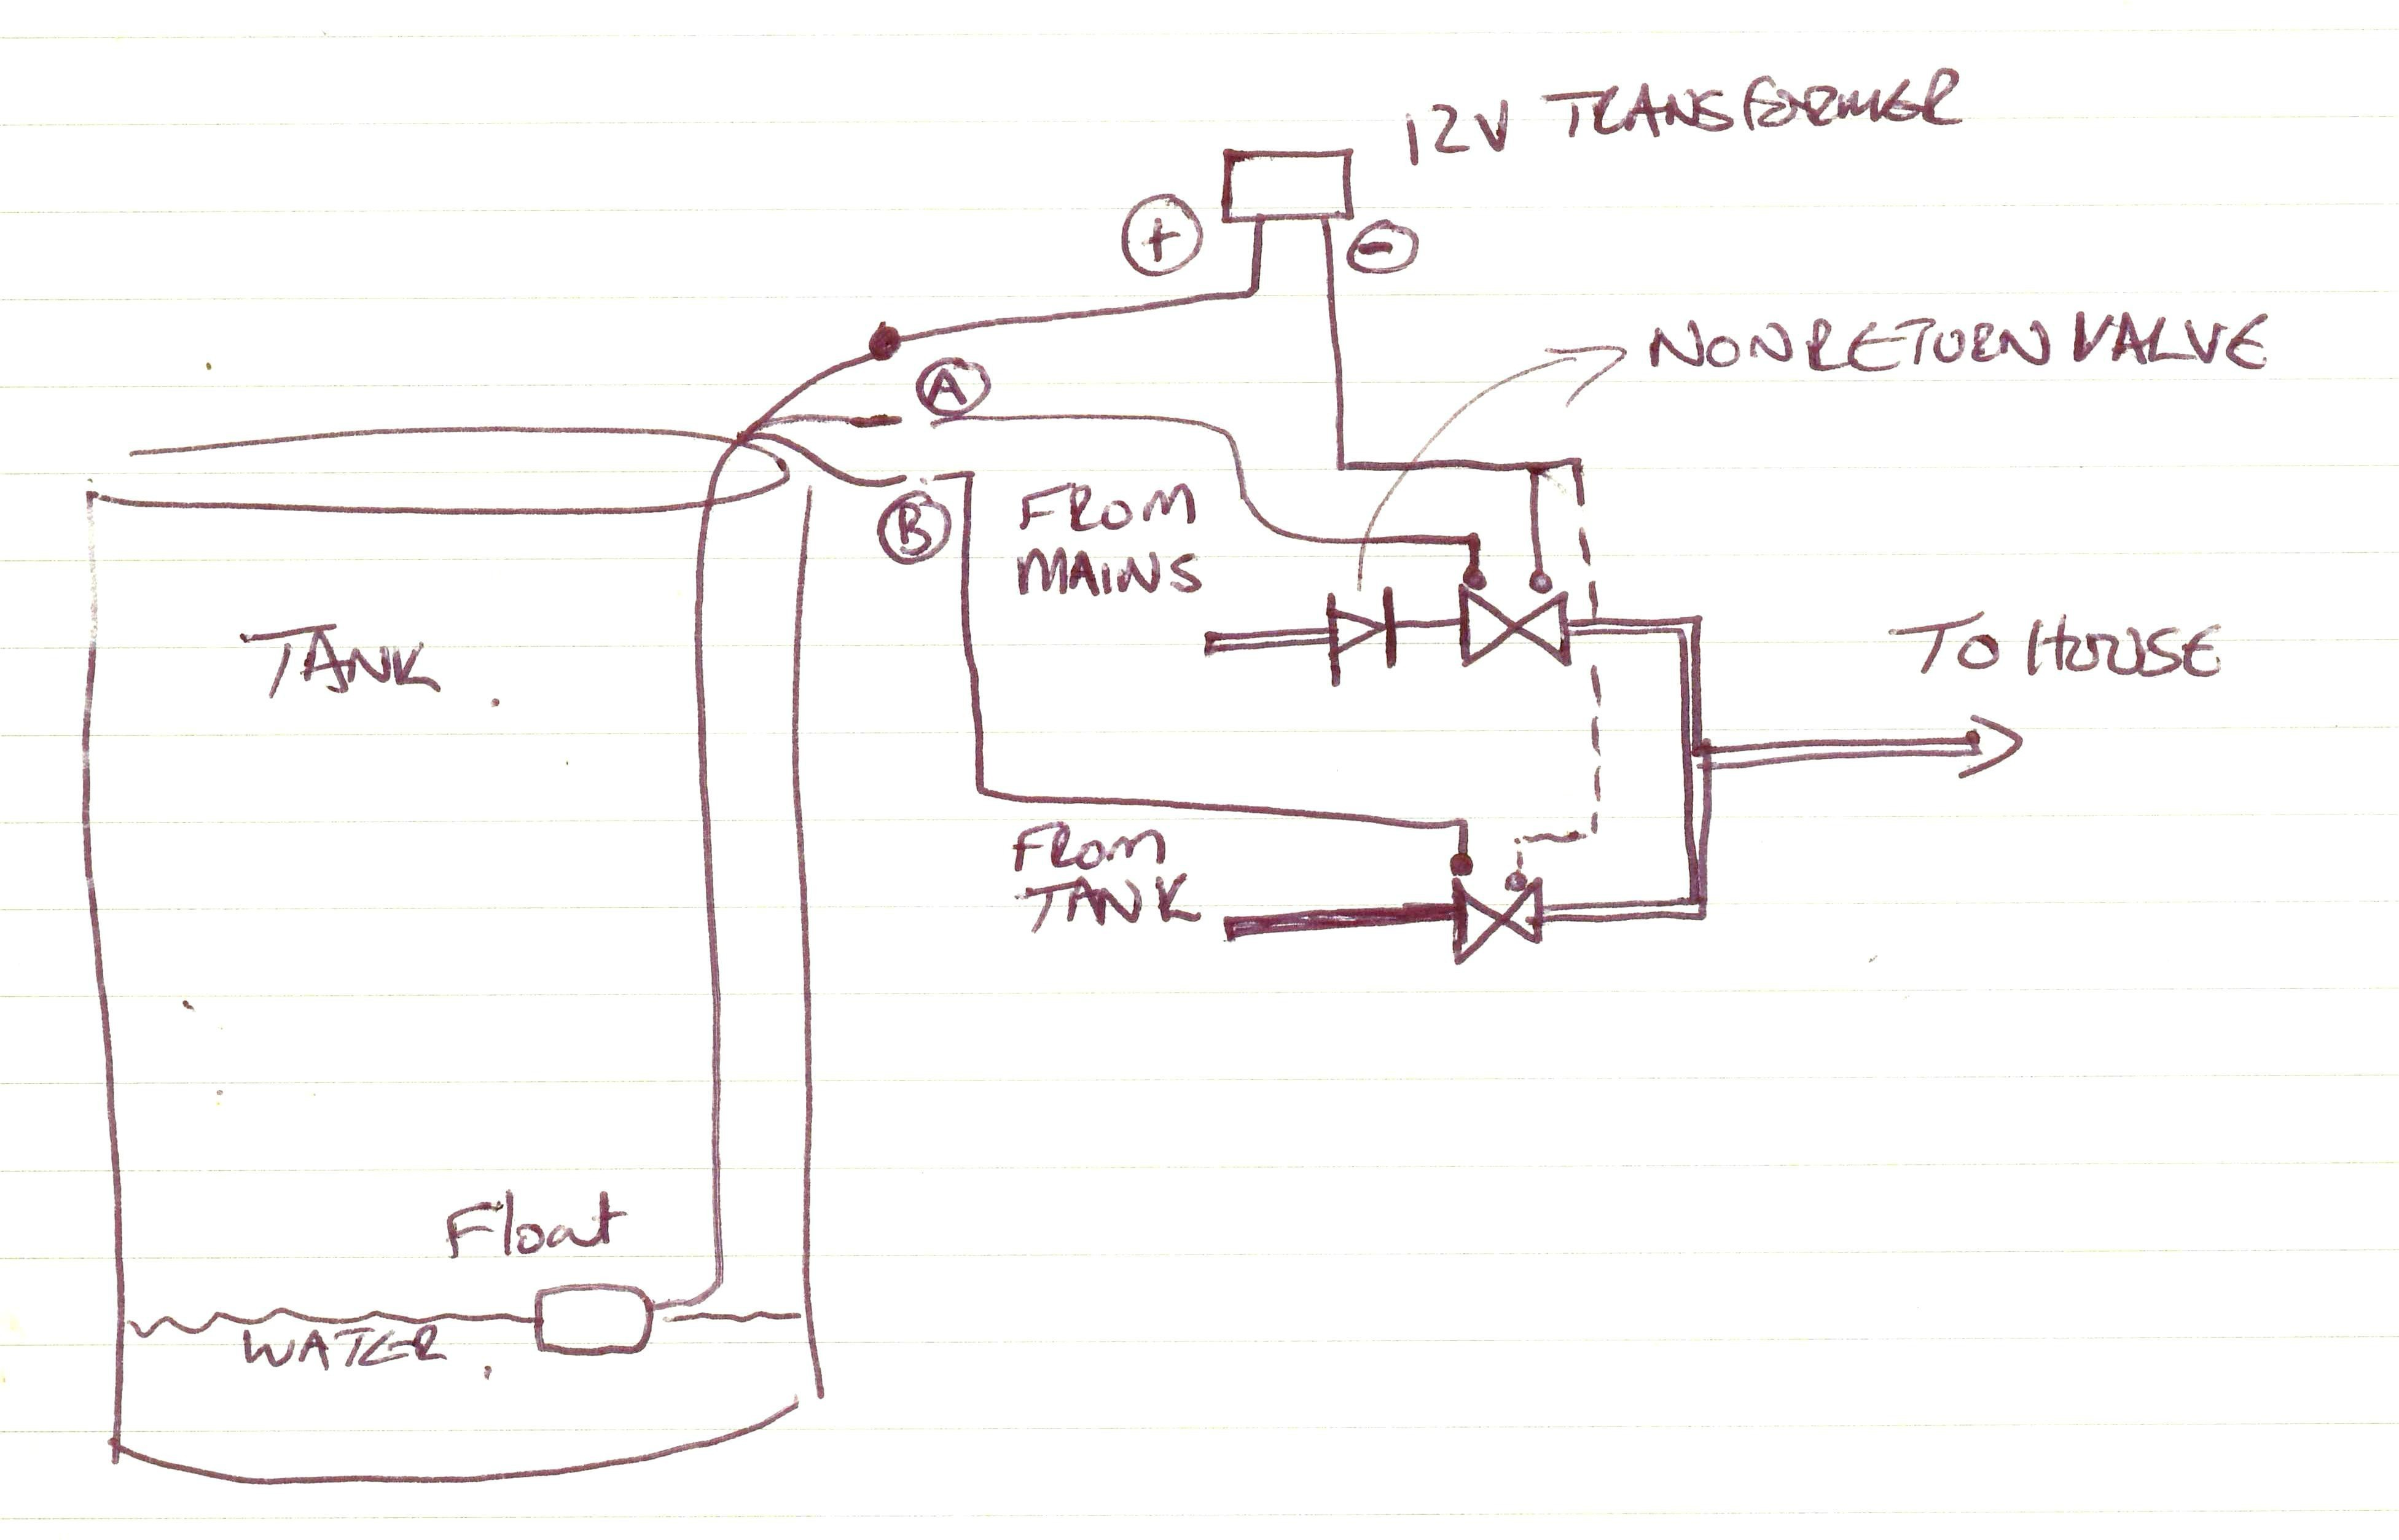 Mac Valve Wiring Diagram New Float Valve Wiring Diagram Wiring Data